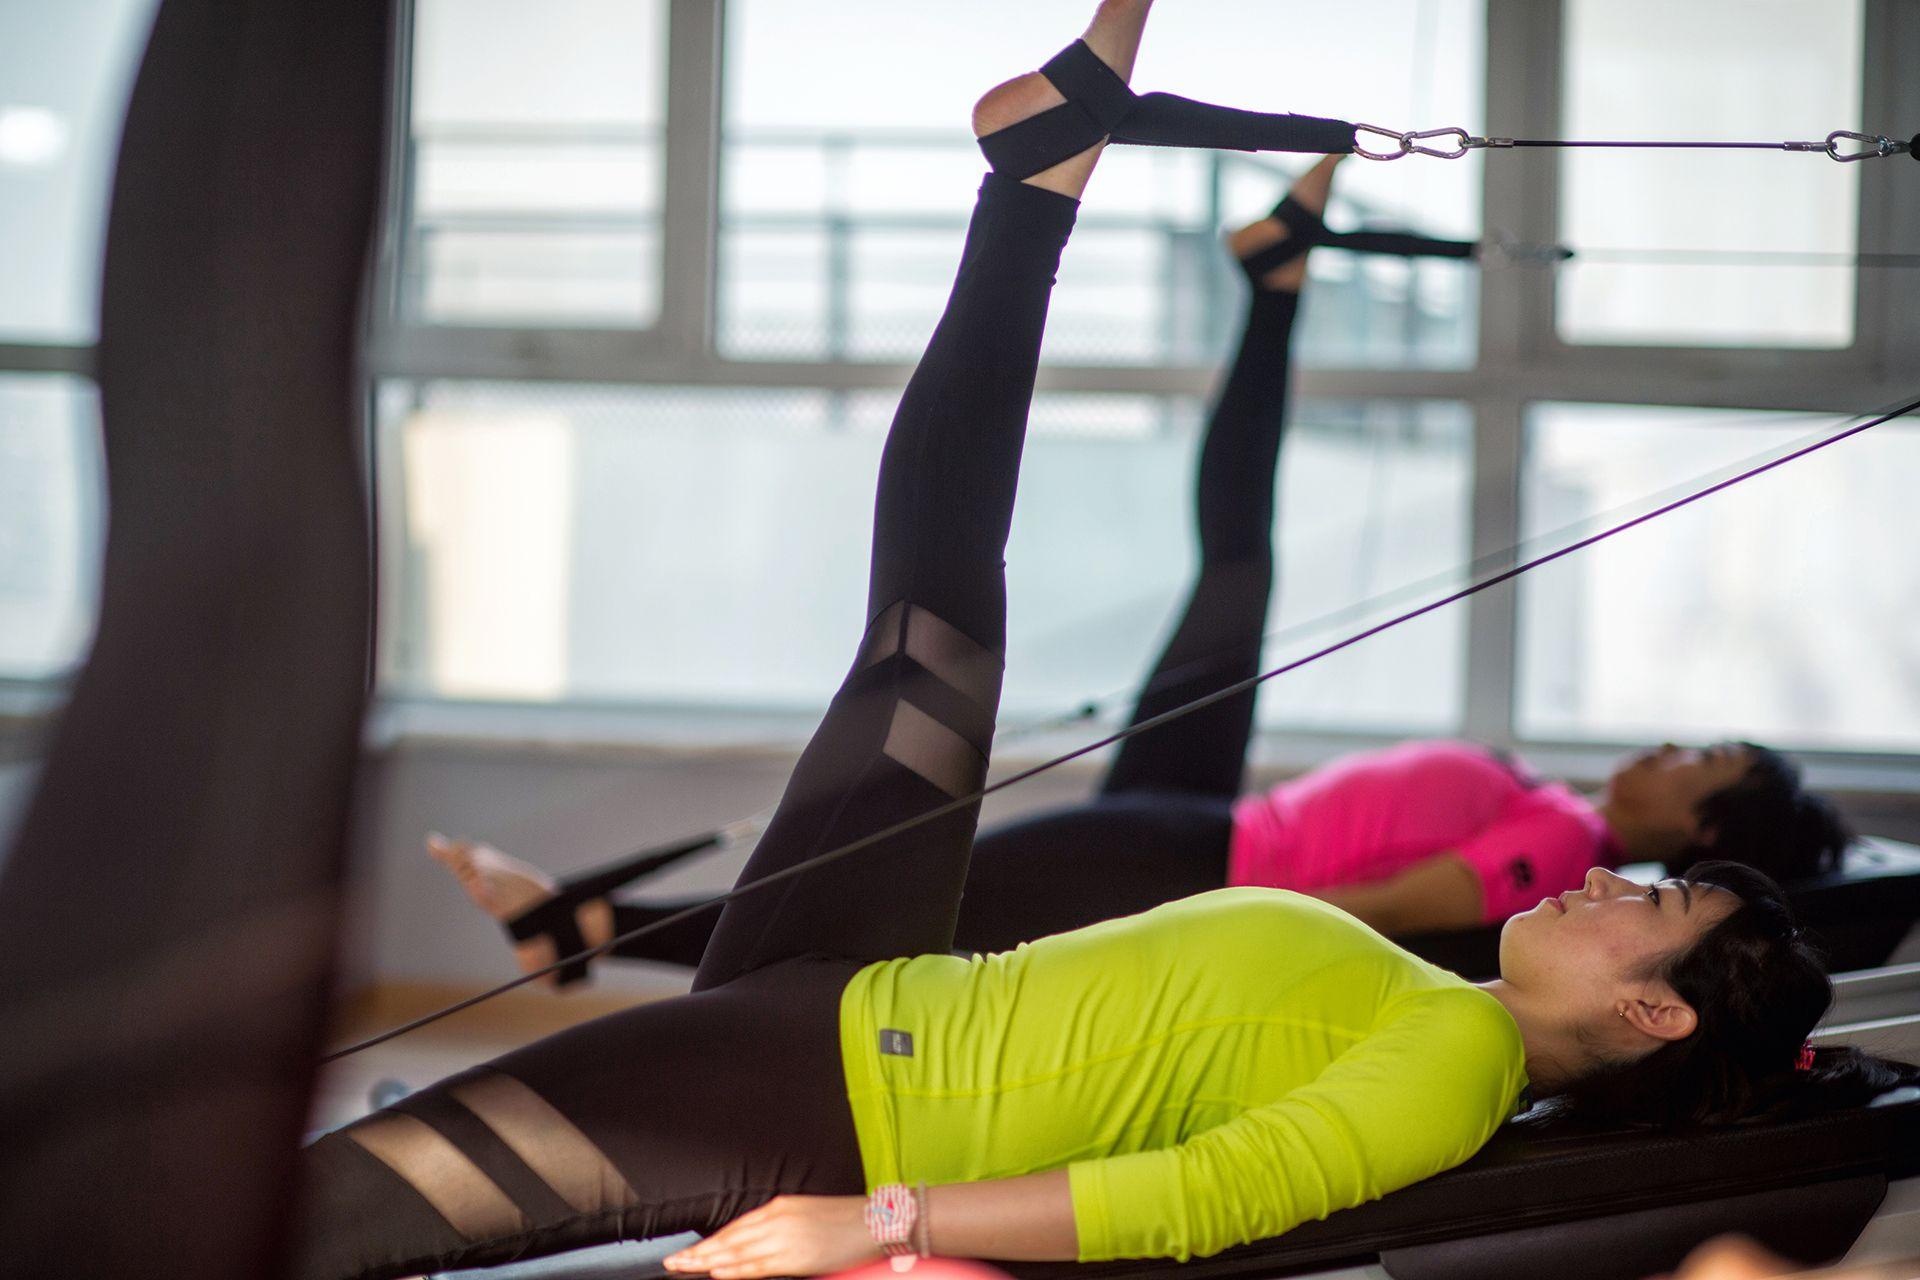 Asiatische Frau macht Pilates Übungen mit Studiogeräten